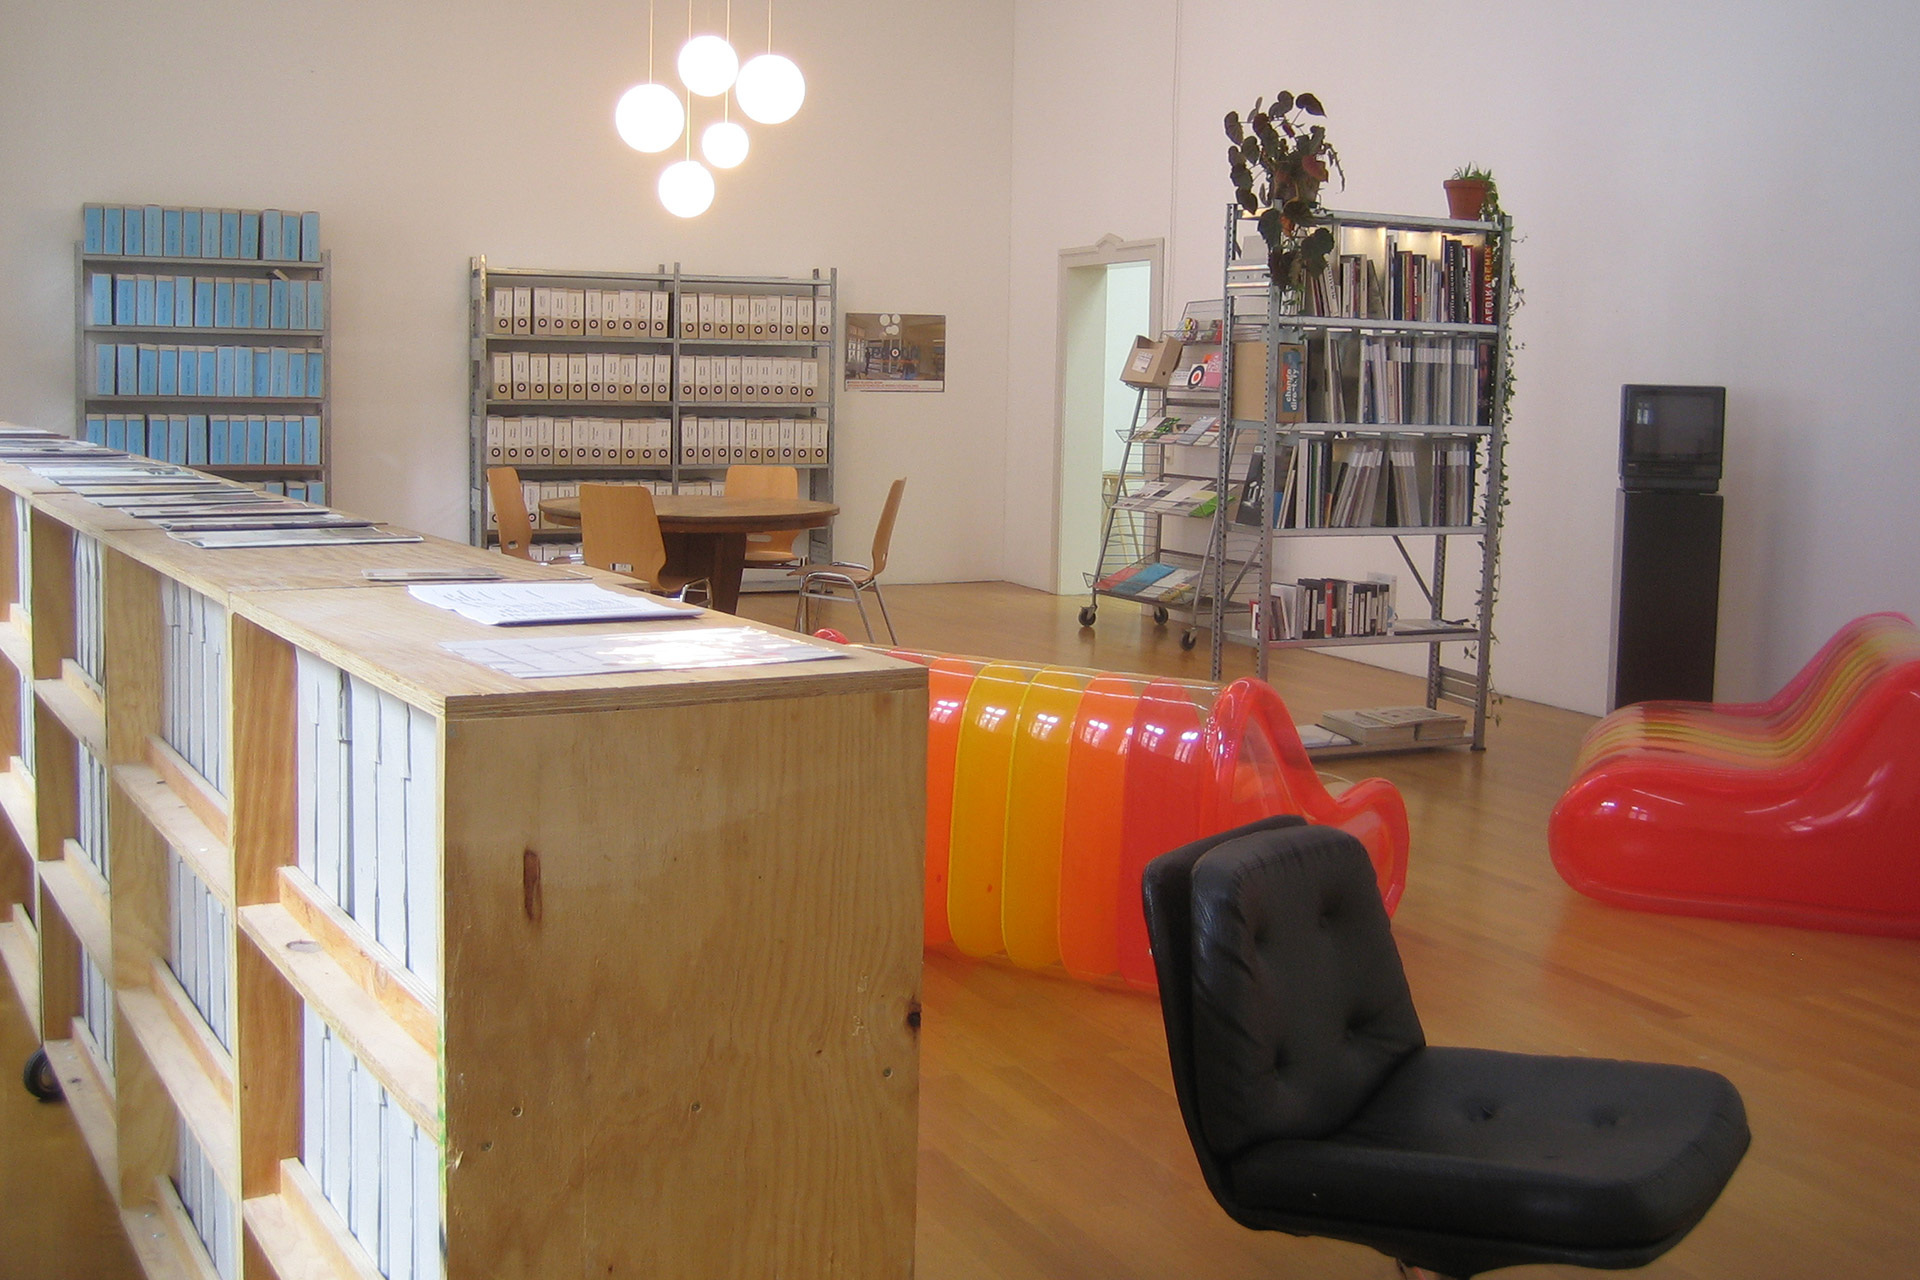 Werk-Dokumentation-Kunsthalle-Winterthur-2007.jpg